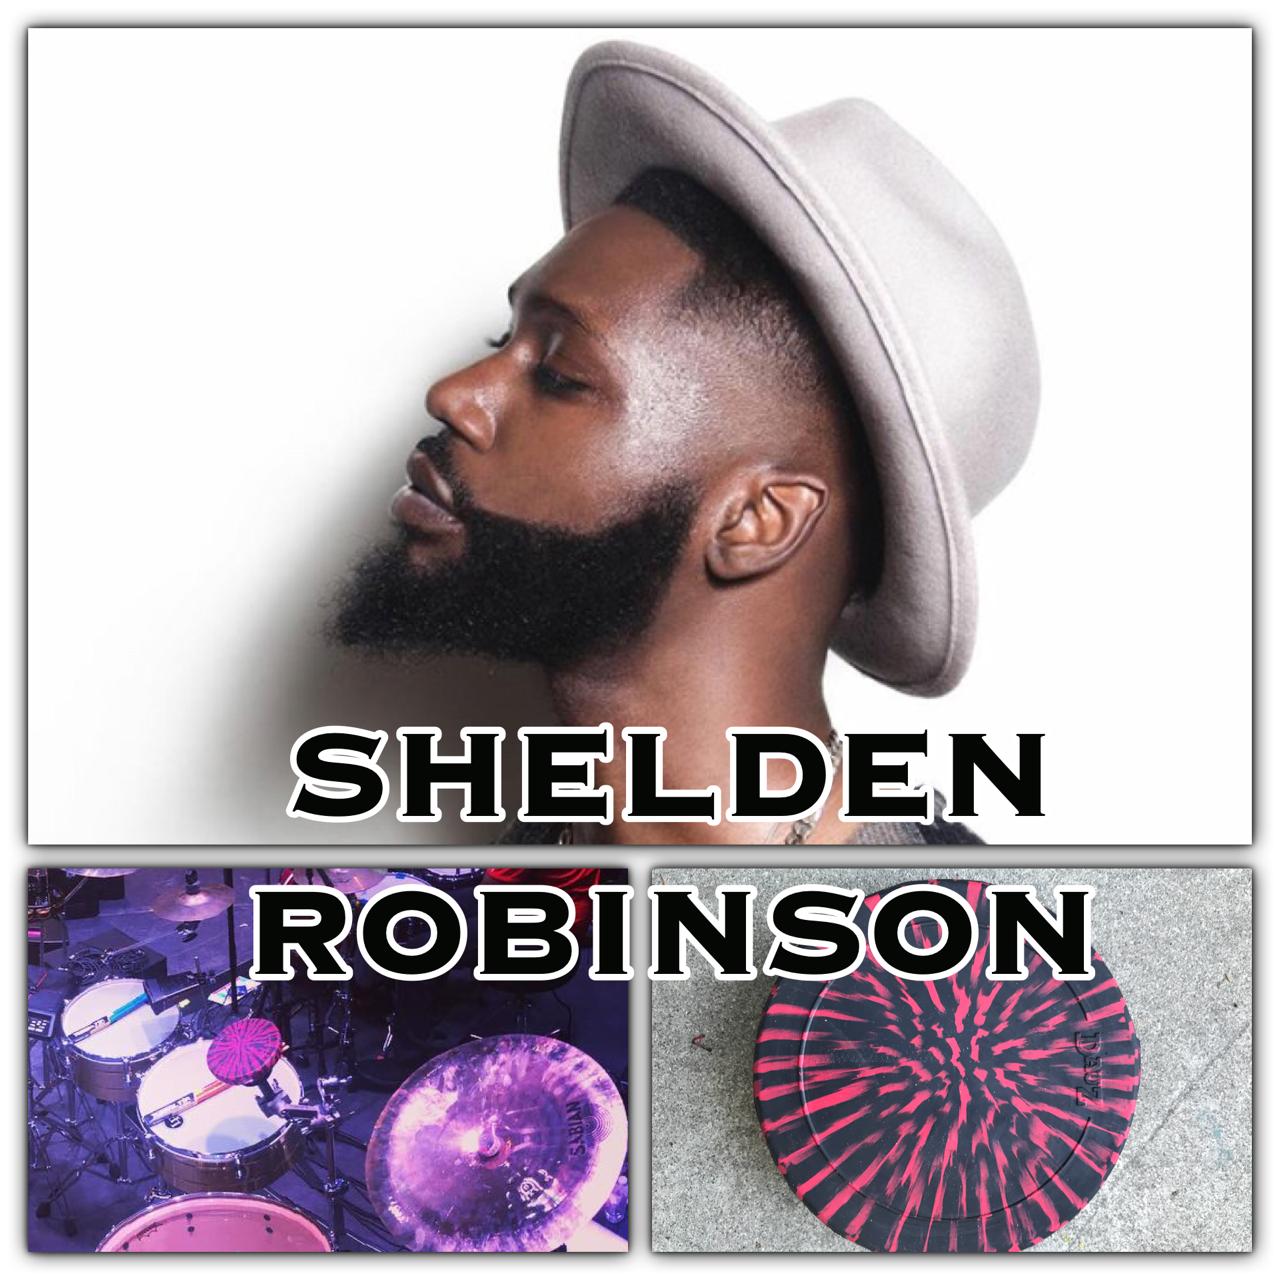 SHELDON ROBINSON